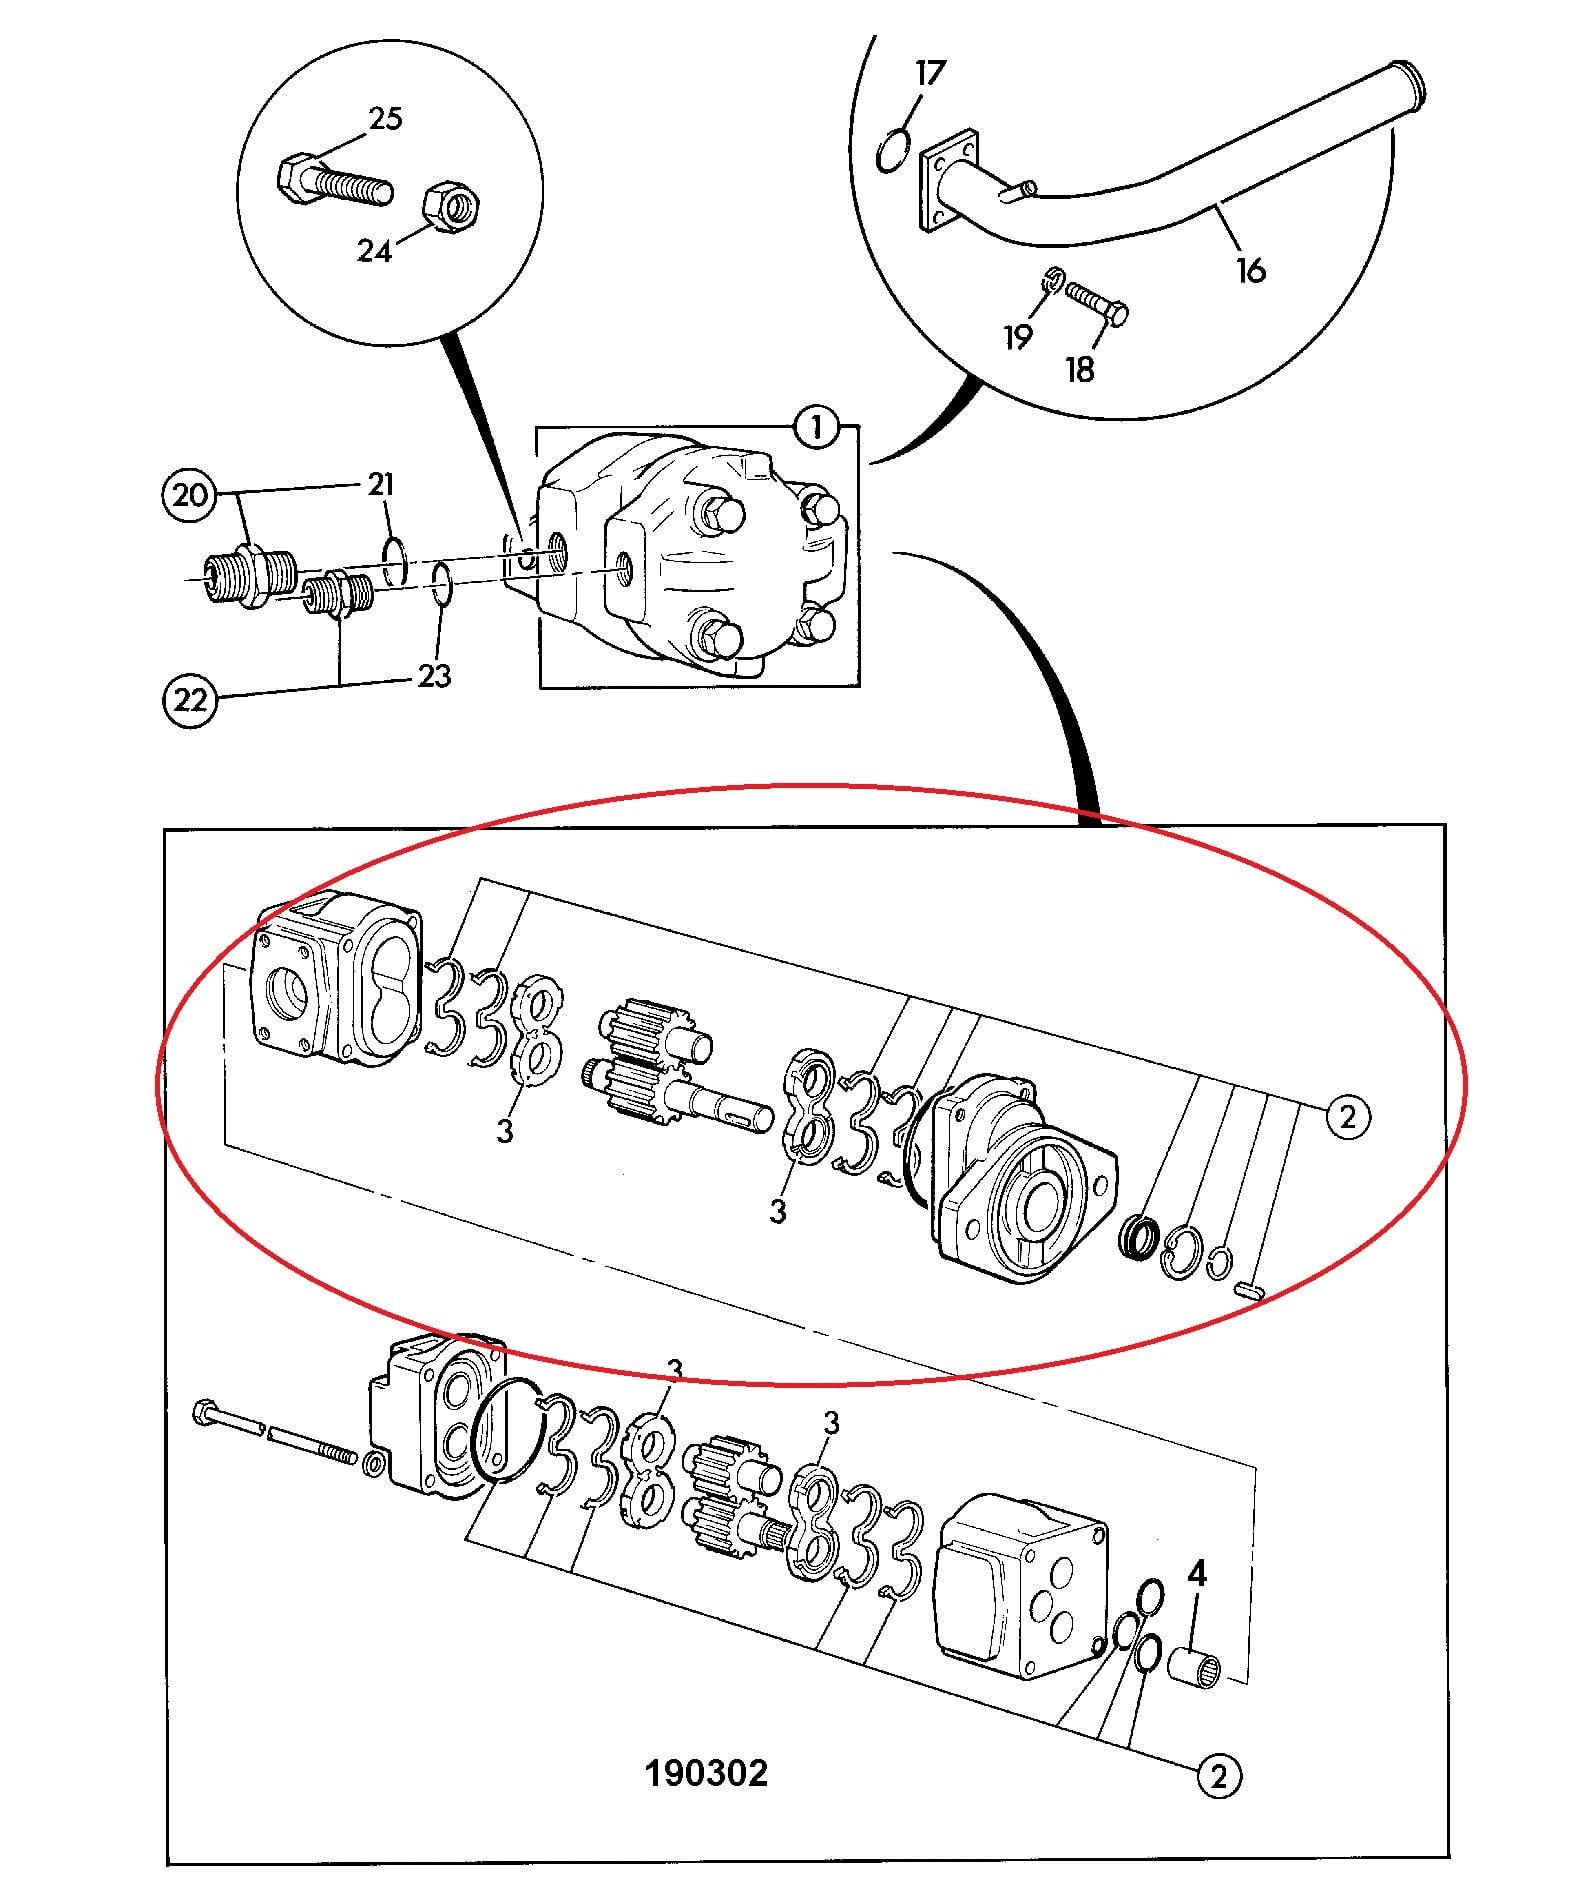 Bomba Hidráulica Principal – JCB 214E (Eixo Chavetado)